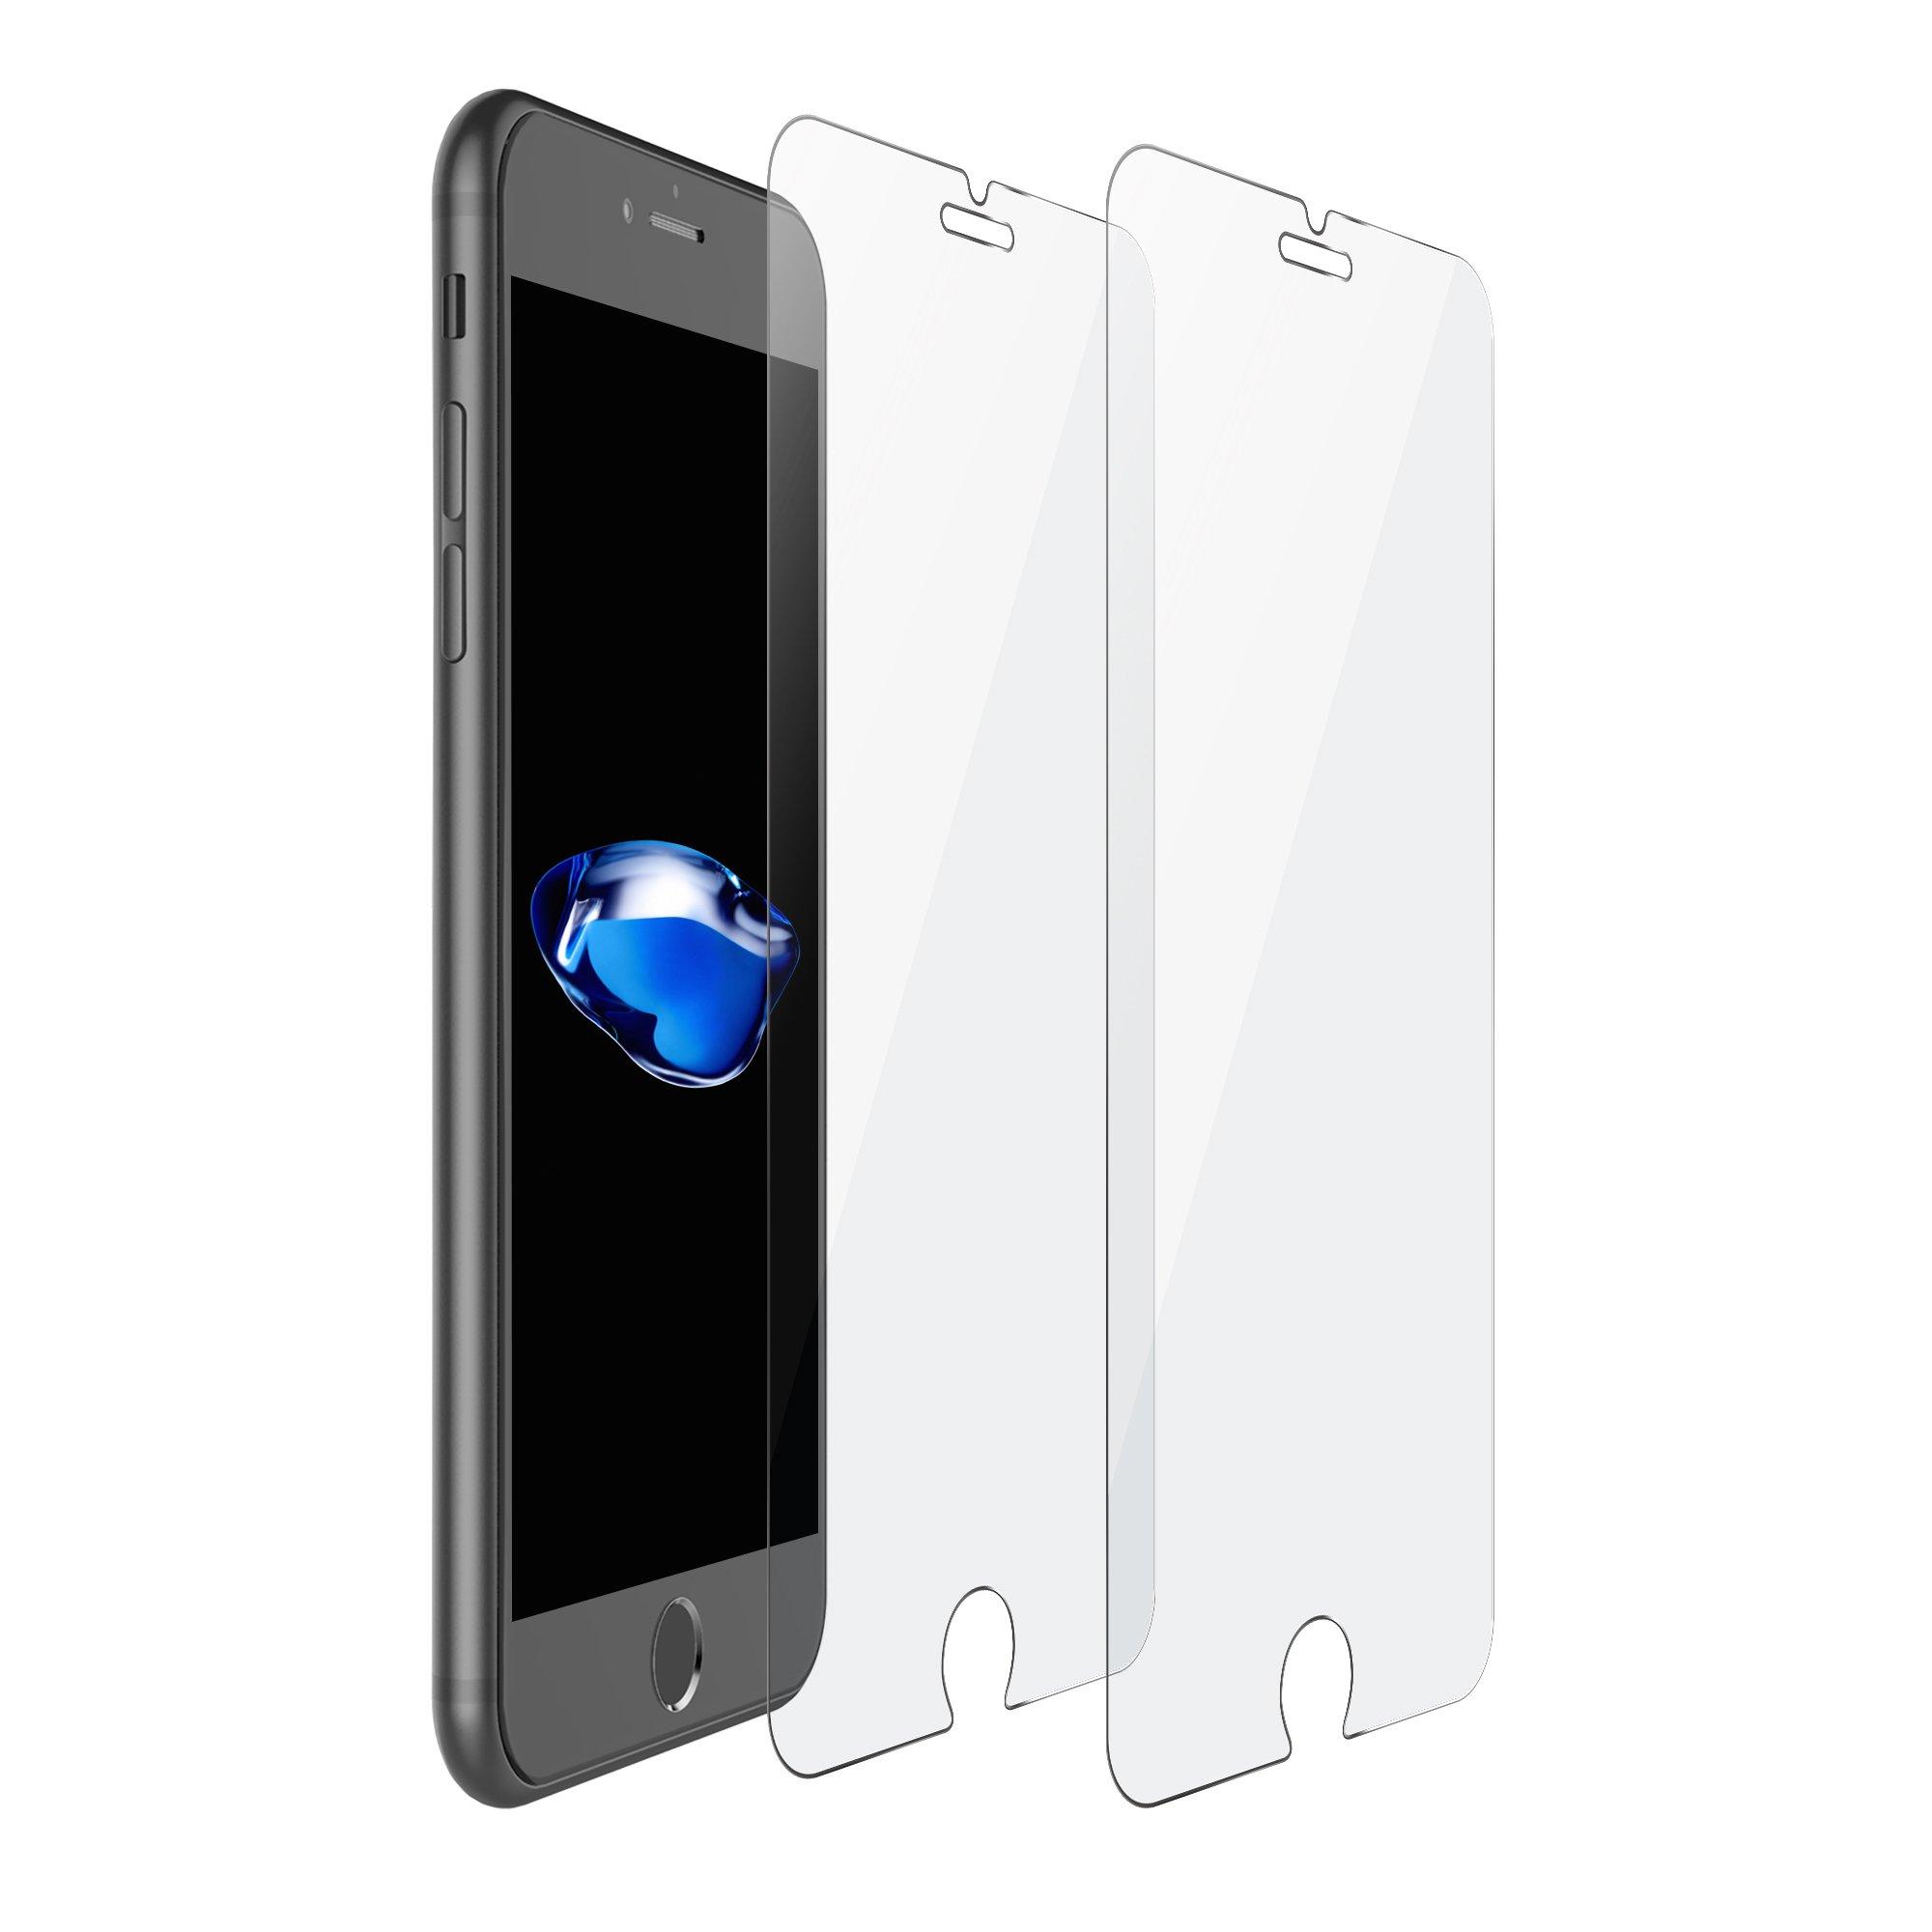 Iphone 7 Plus Screen Protector Iorange-E 2 Pack Iphone 7 Plus Tempered Glass .. 14